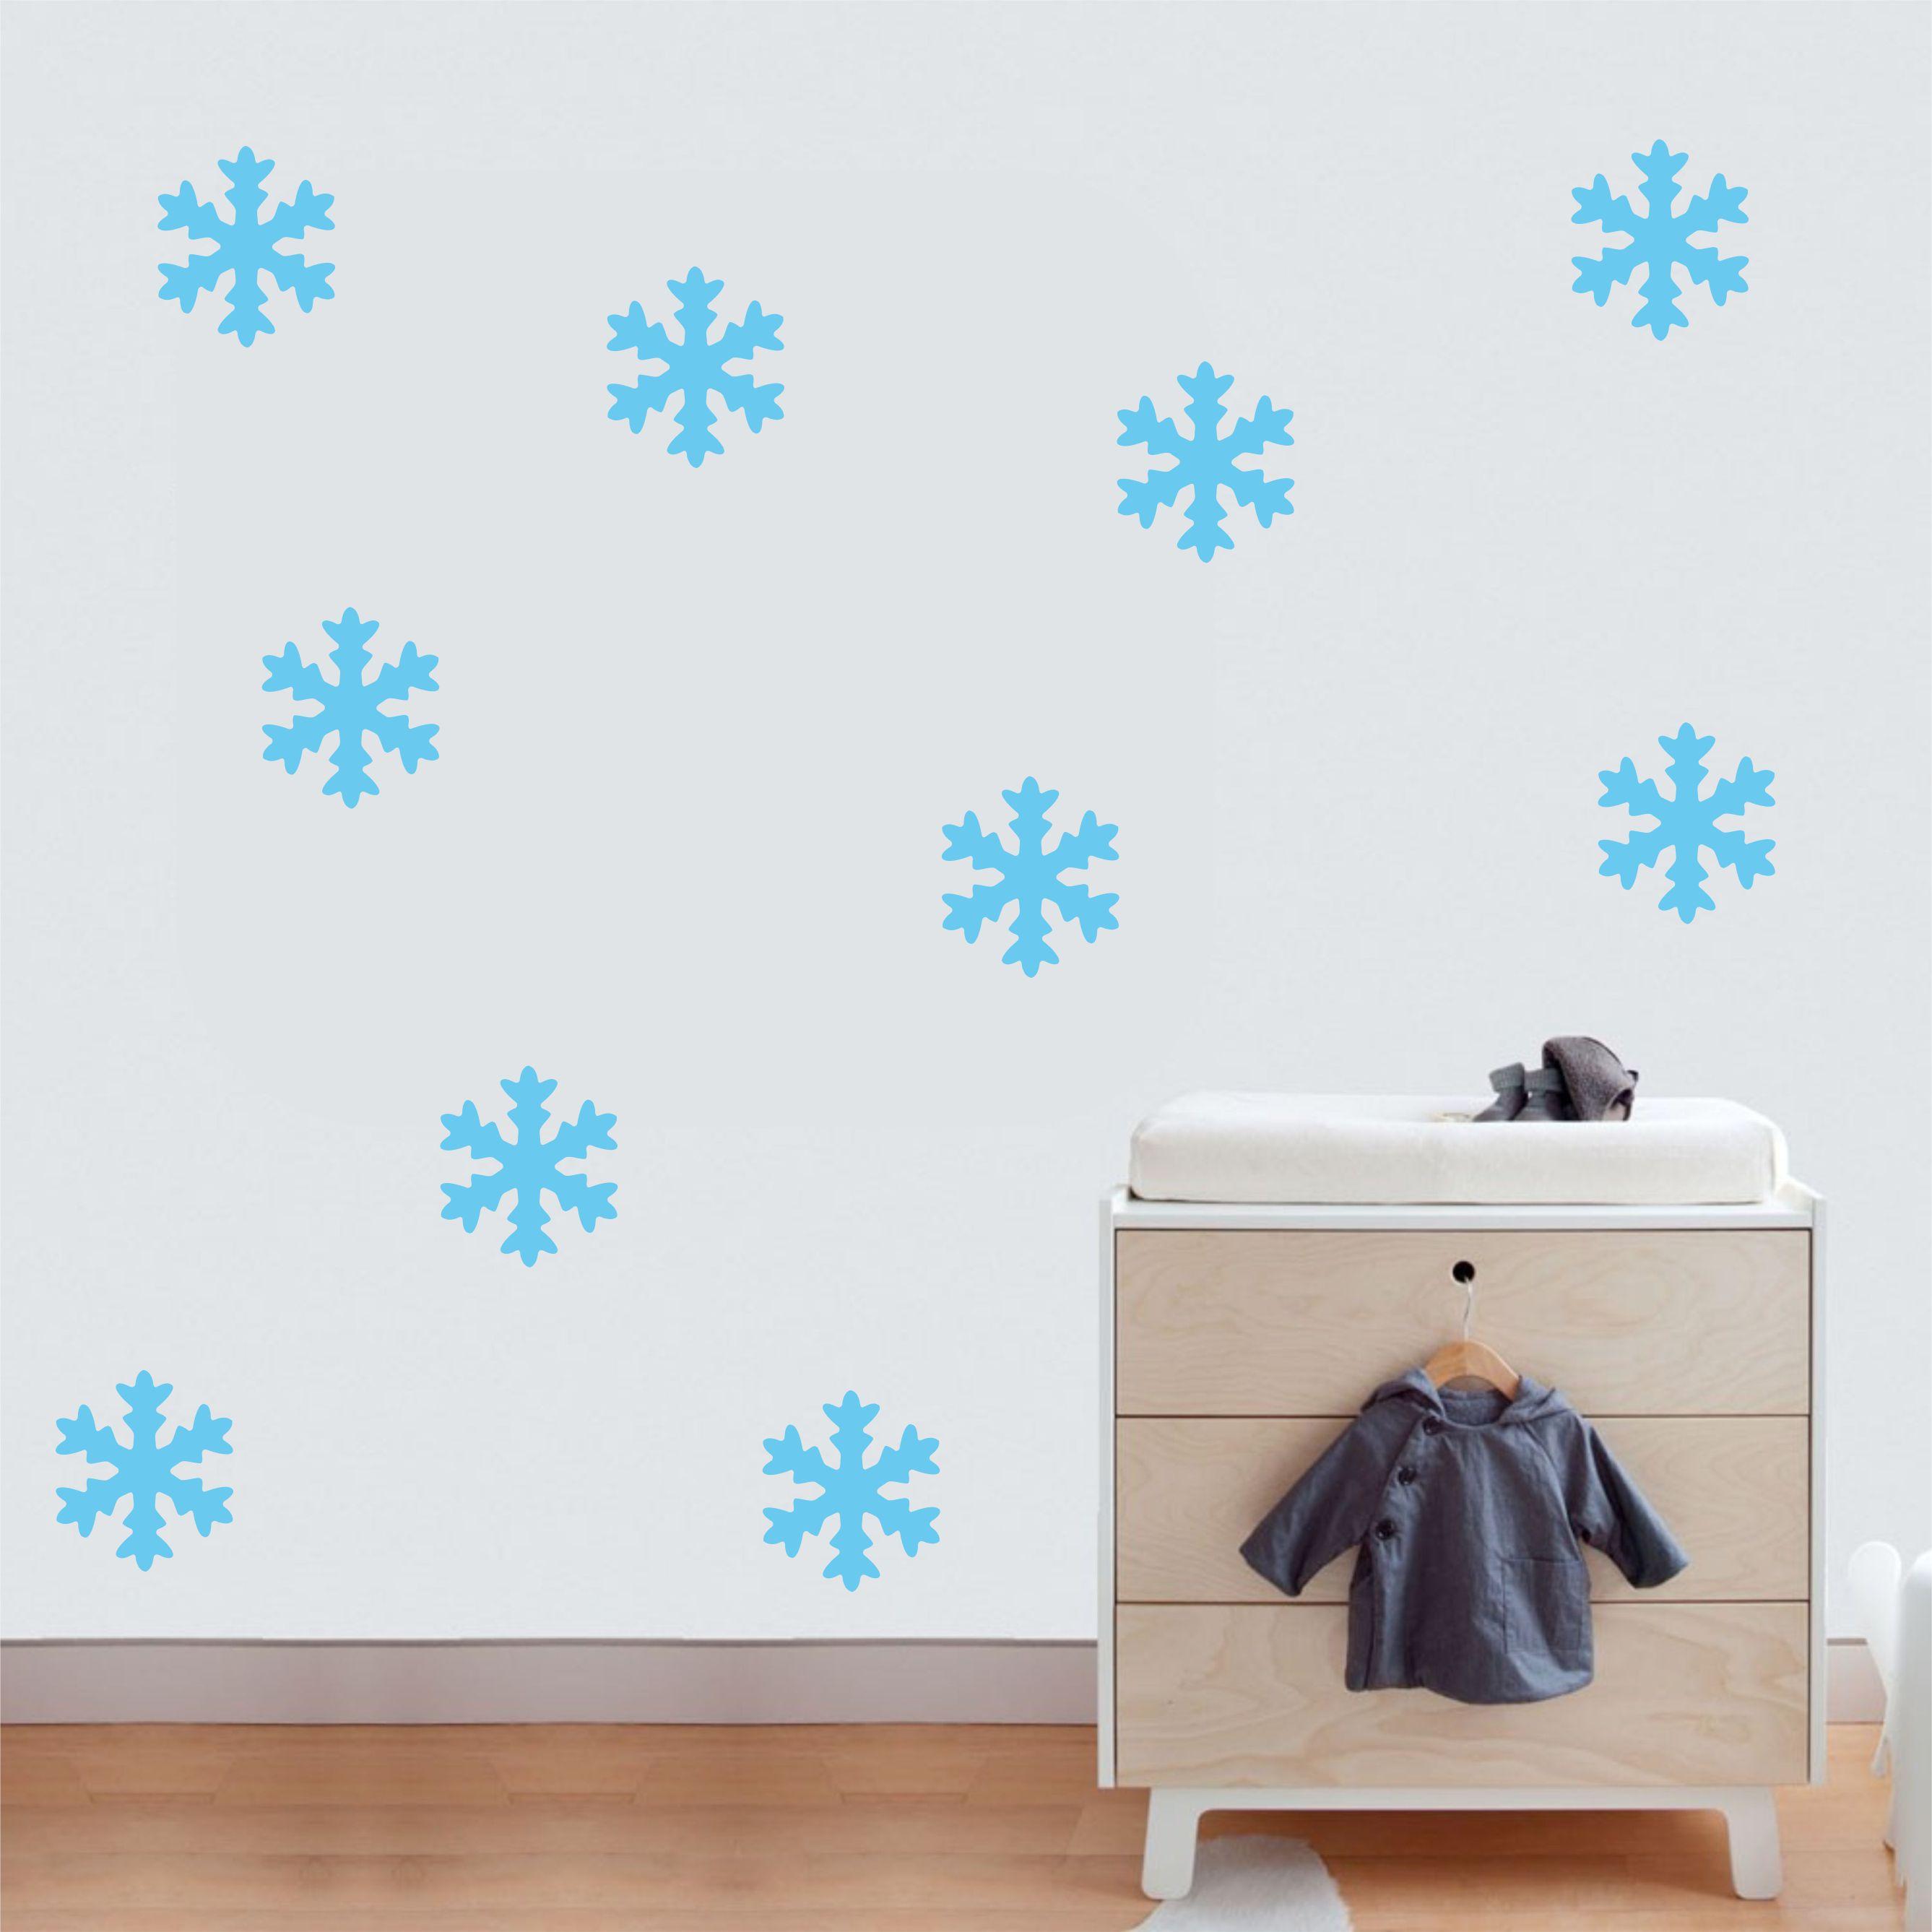 Aparador Walmart ~ Adesivo Parede Frozen Kit Floco de Neve Inove Brindes Elo7